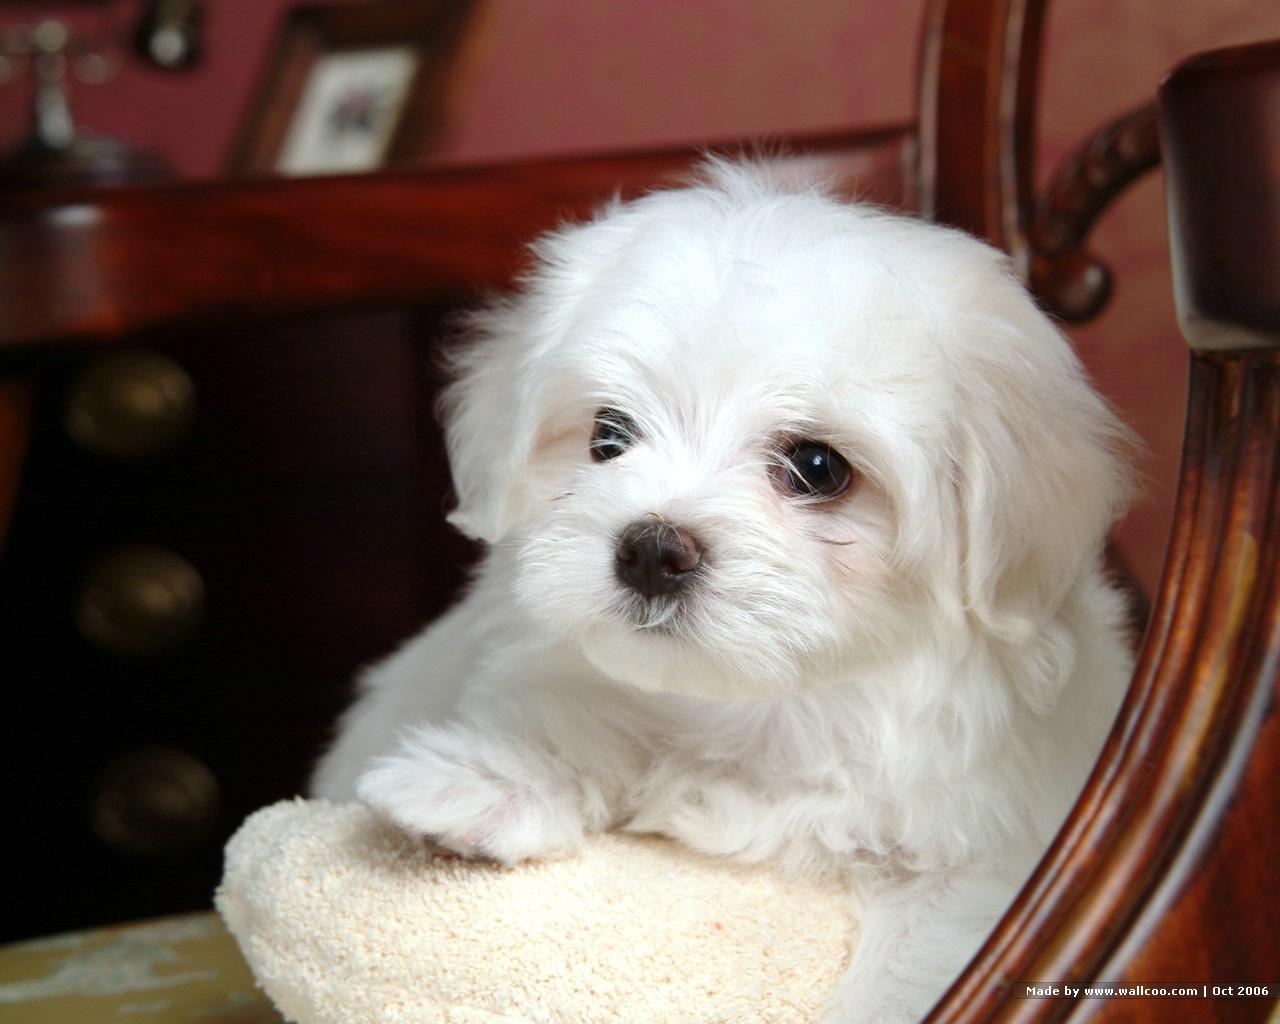 http://1.bp.blogspot.com/_FNQgkfCwYxs/TUaFwEb8ZvI/AAAAAAAAC98/UPG-6-u1gMk/s1600/white%2Bdog%2Bcute-5.jpg